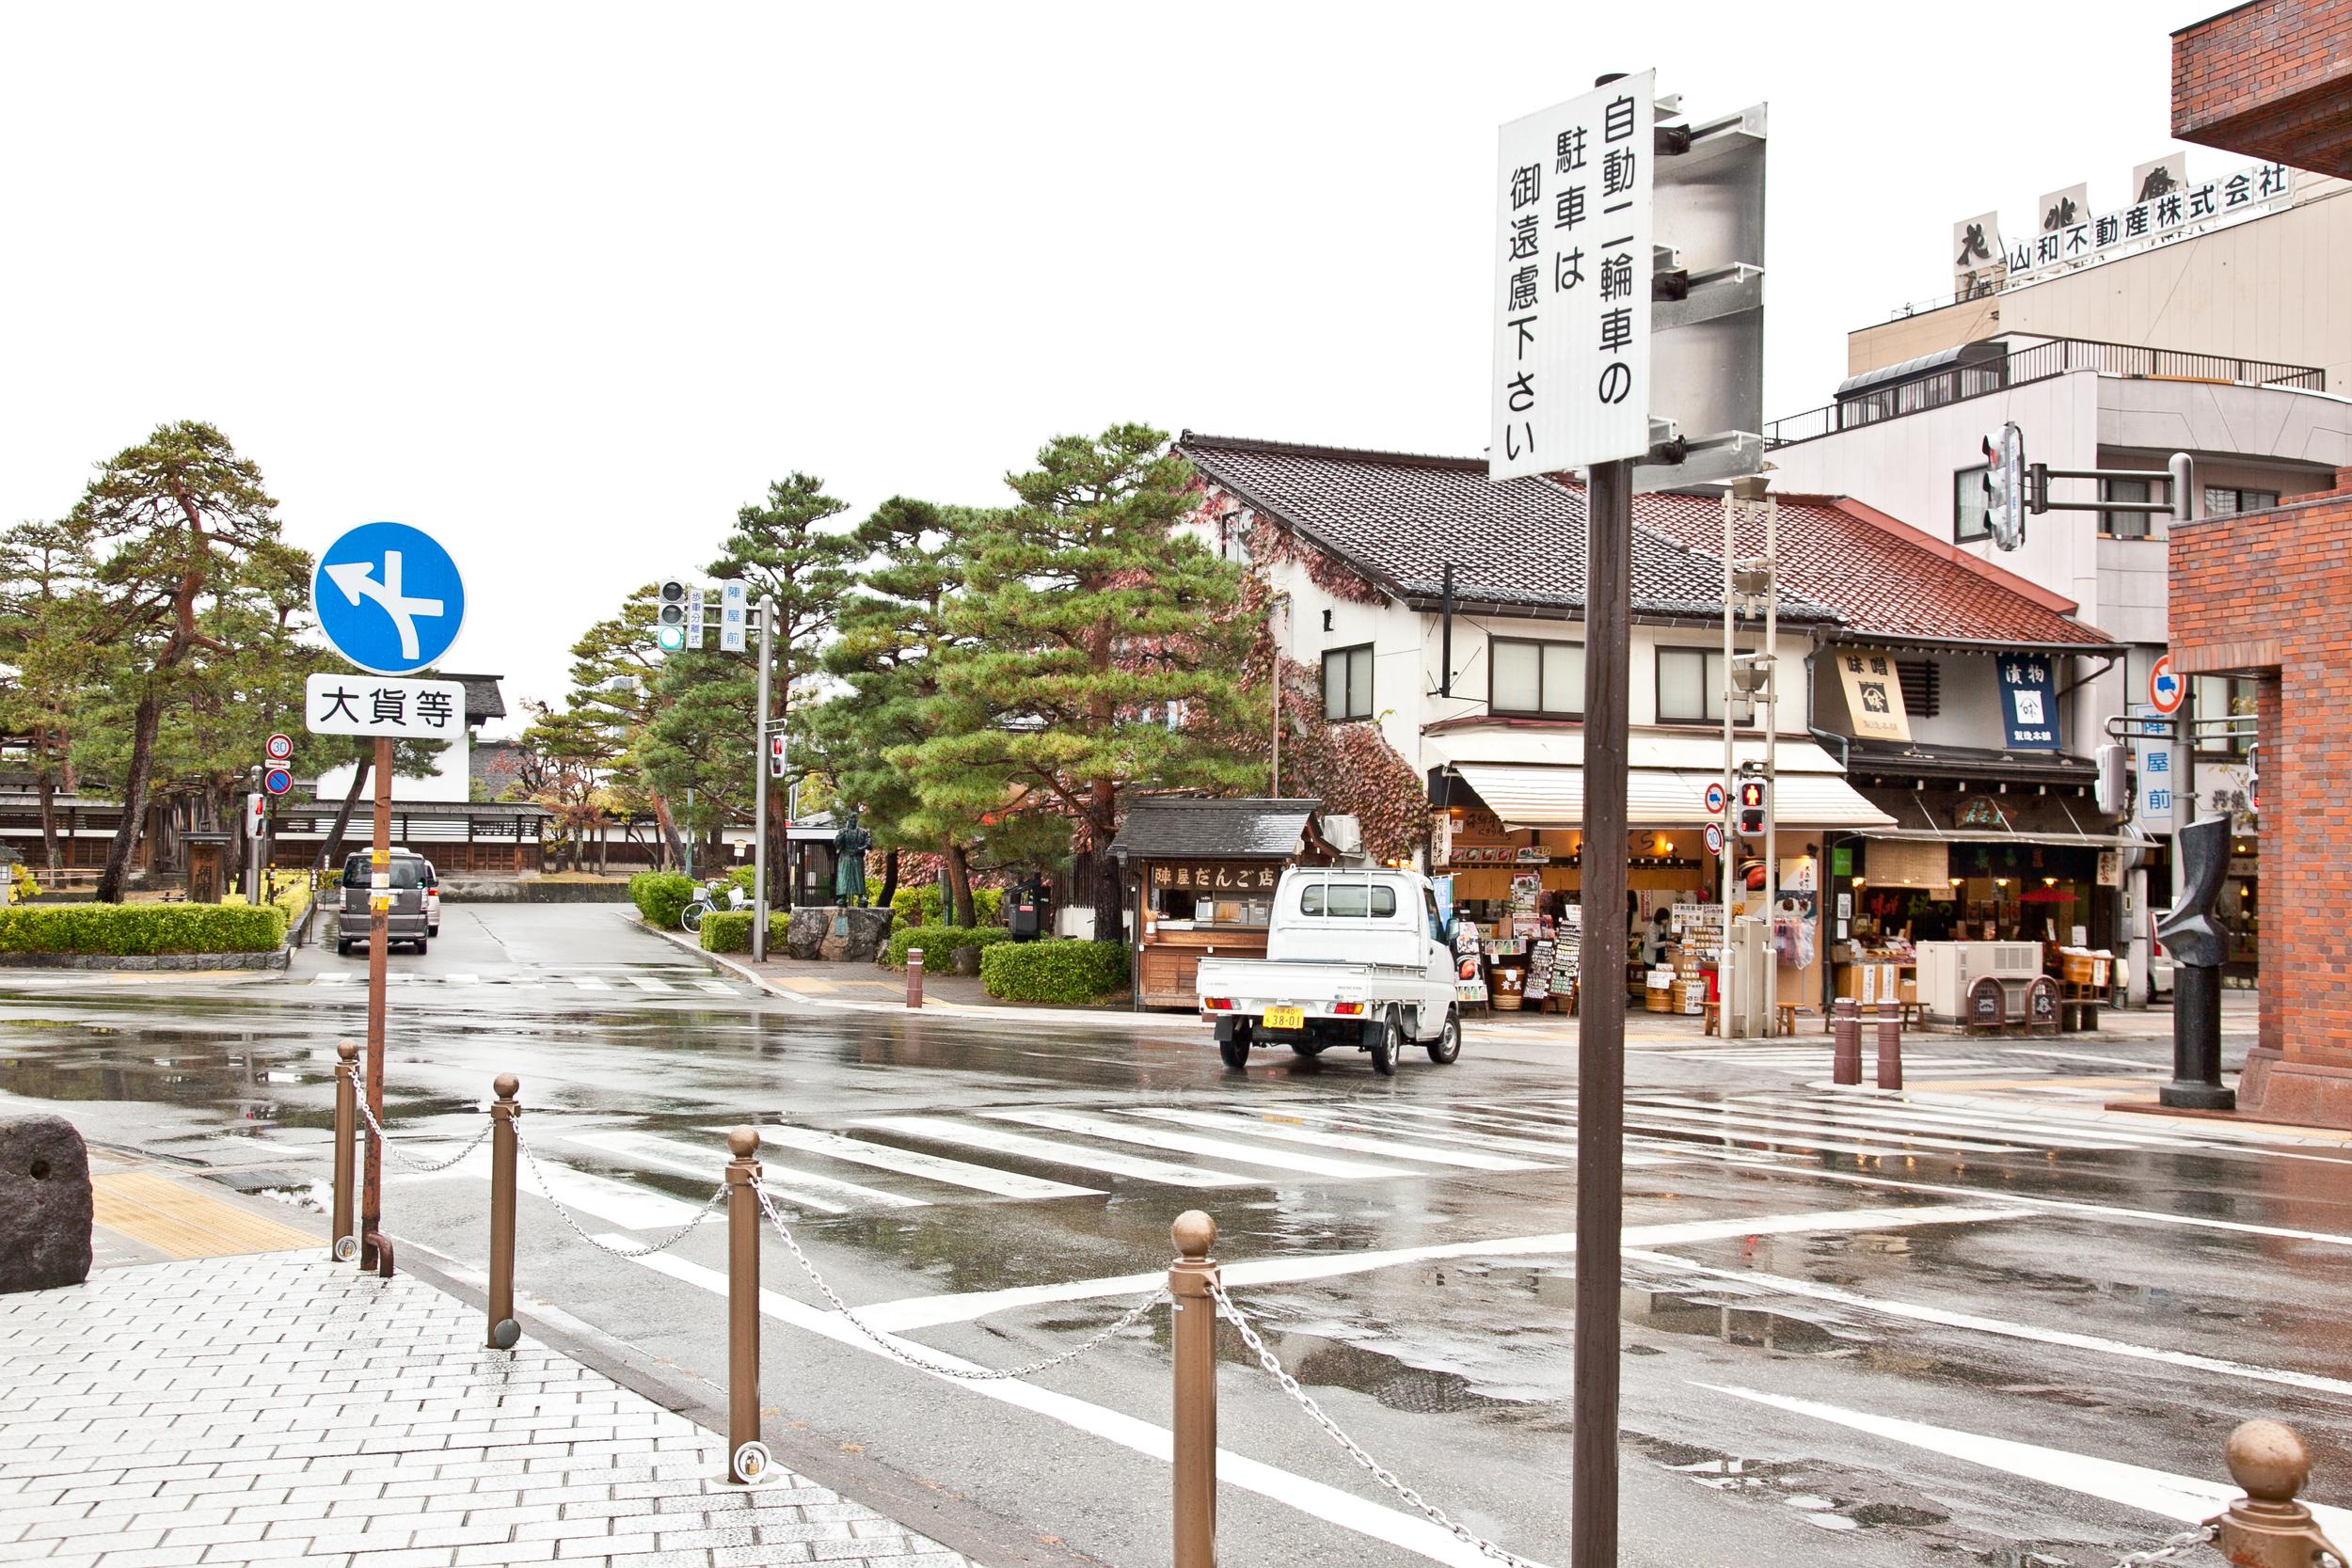 IMG_6854-takayama-japan-alps-trisa-taro.jpg